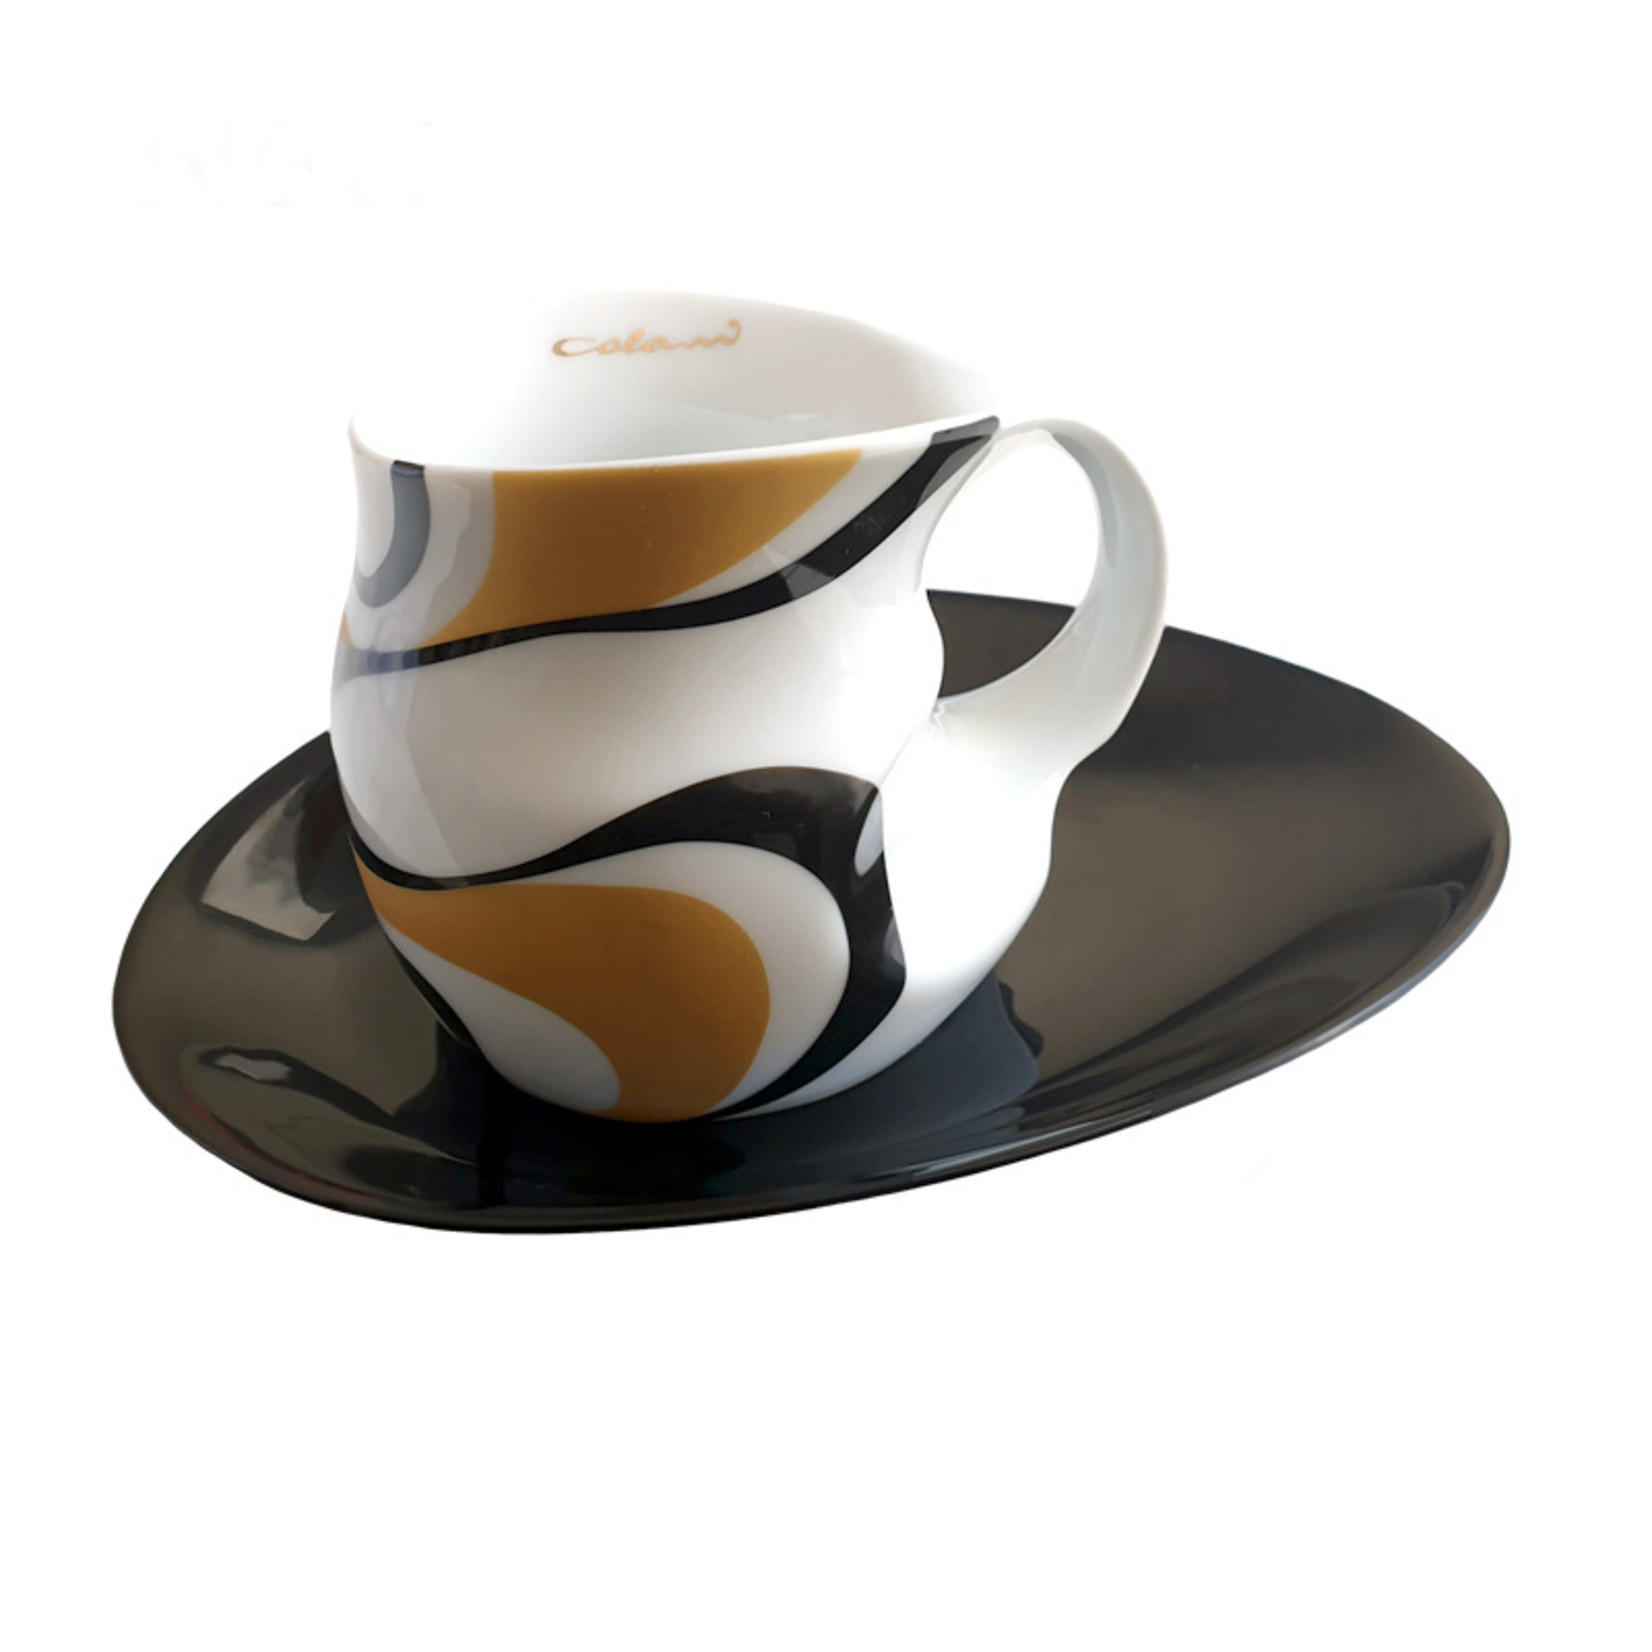 Colani Porzellanserie Colani Kaffee-/Cappuccinotasse I gold-schwarz I Porzellan